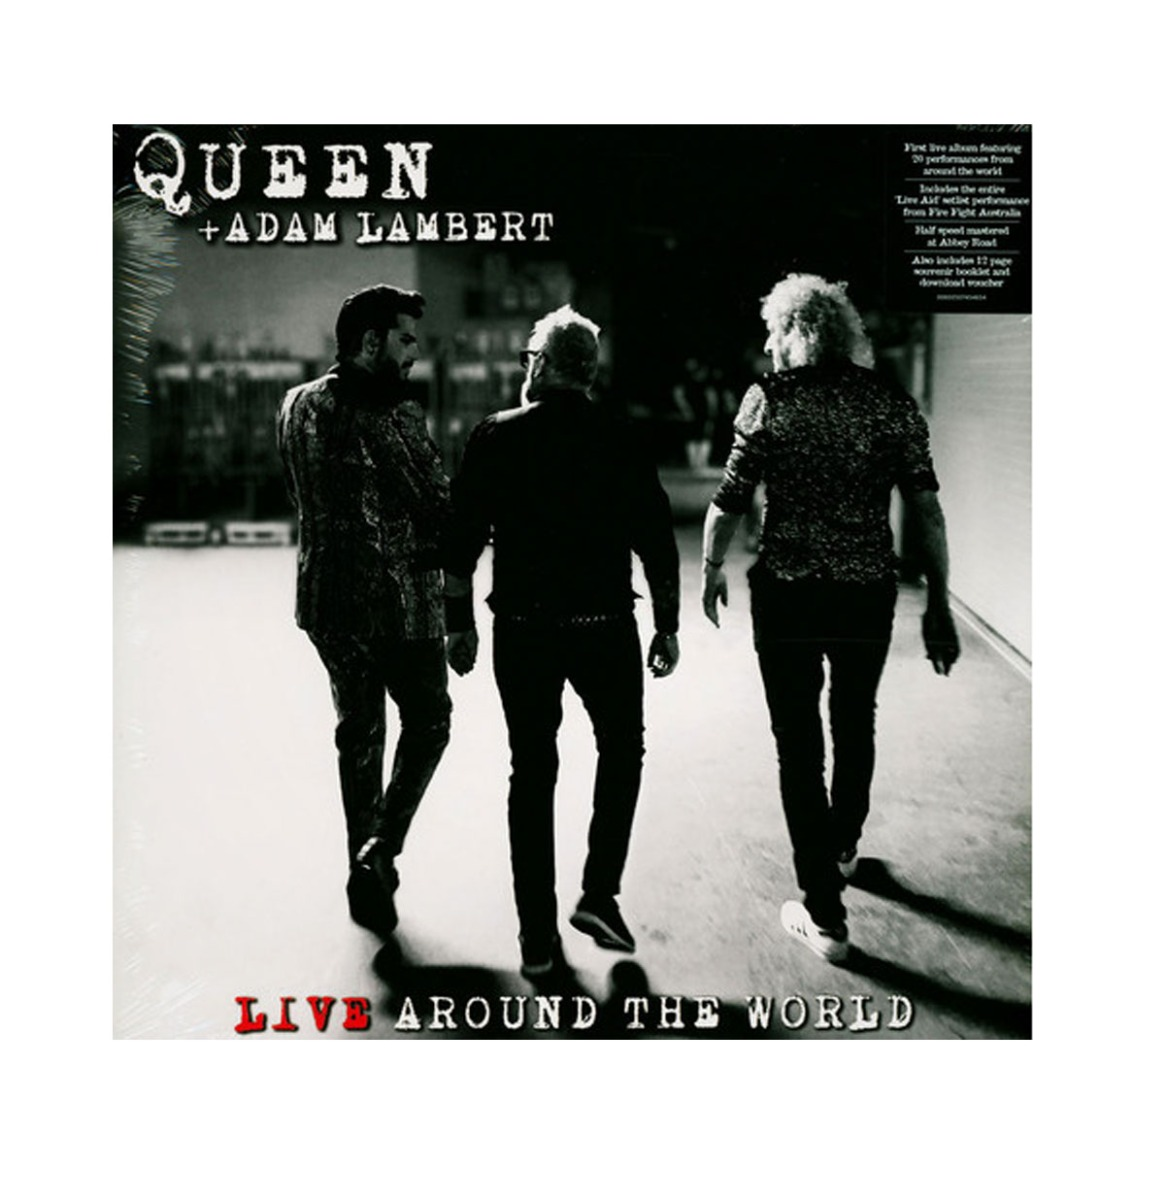 Queen & Adam Lambert Live Around The World LP